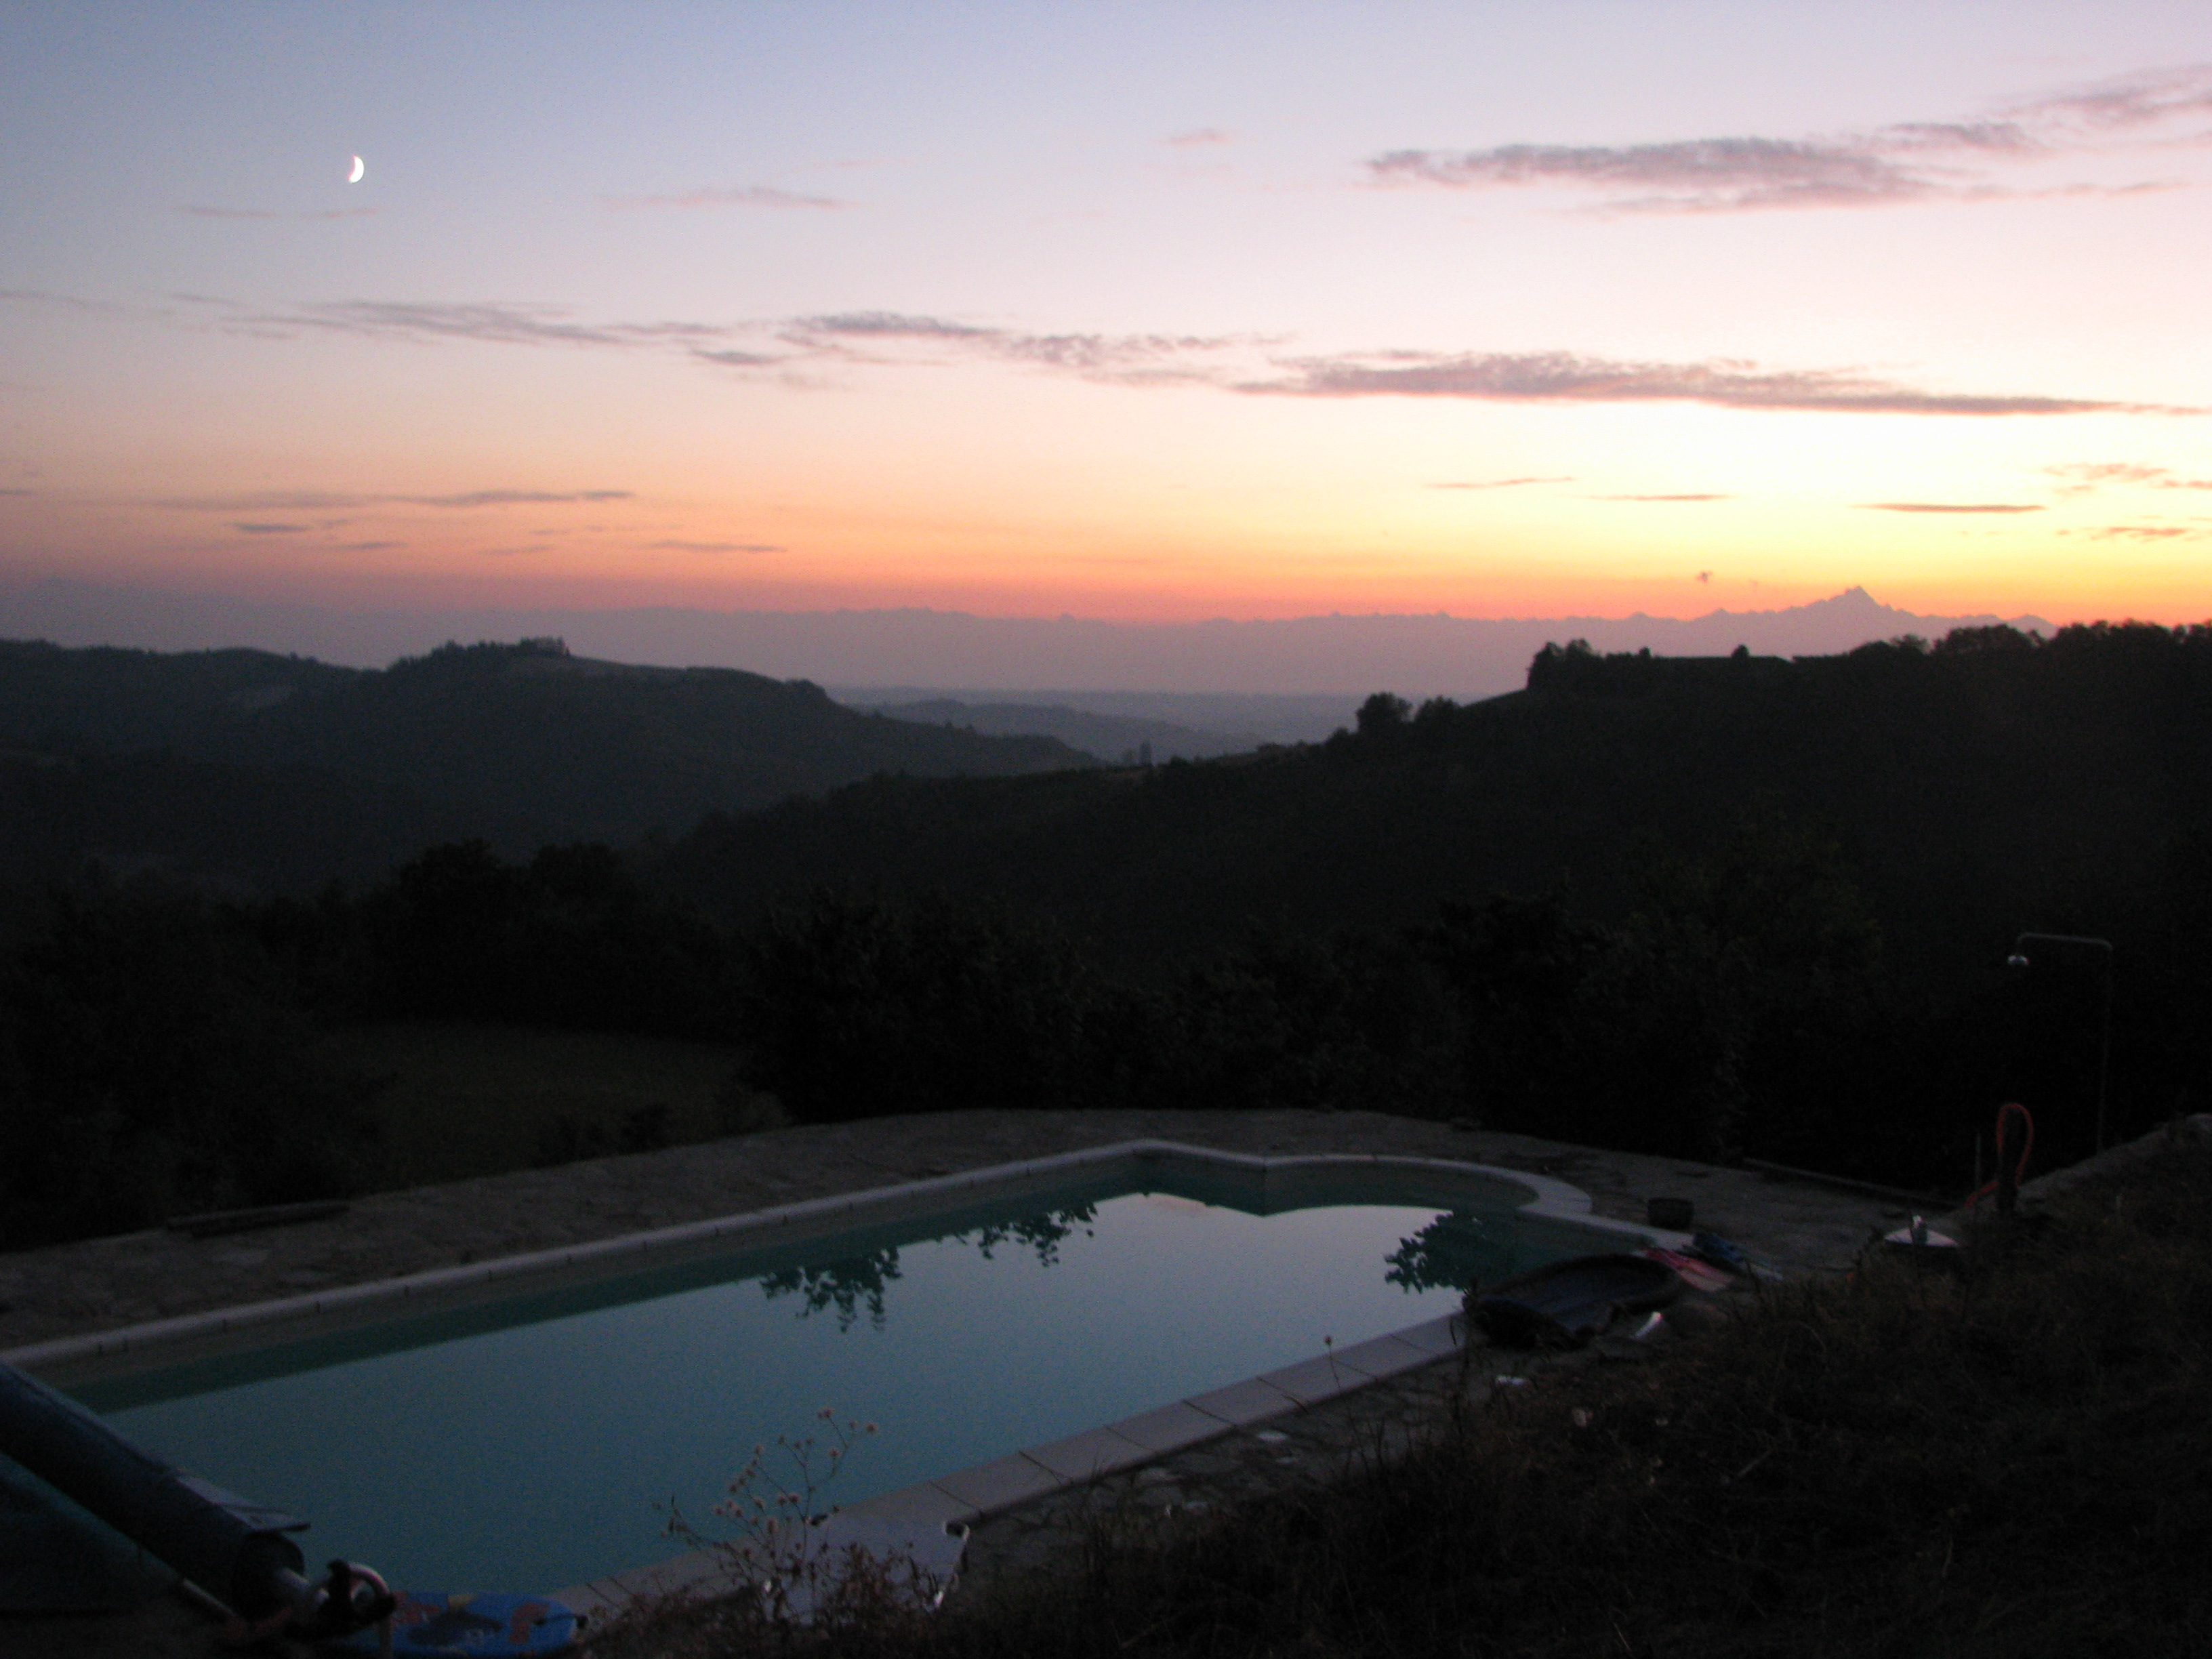 Zwembad La Casa Vecchia bij avondlicht